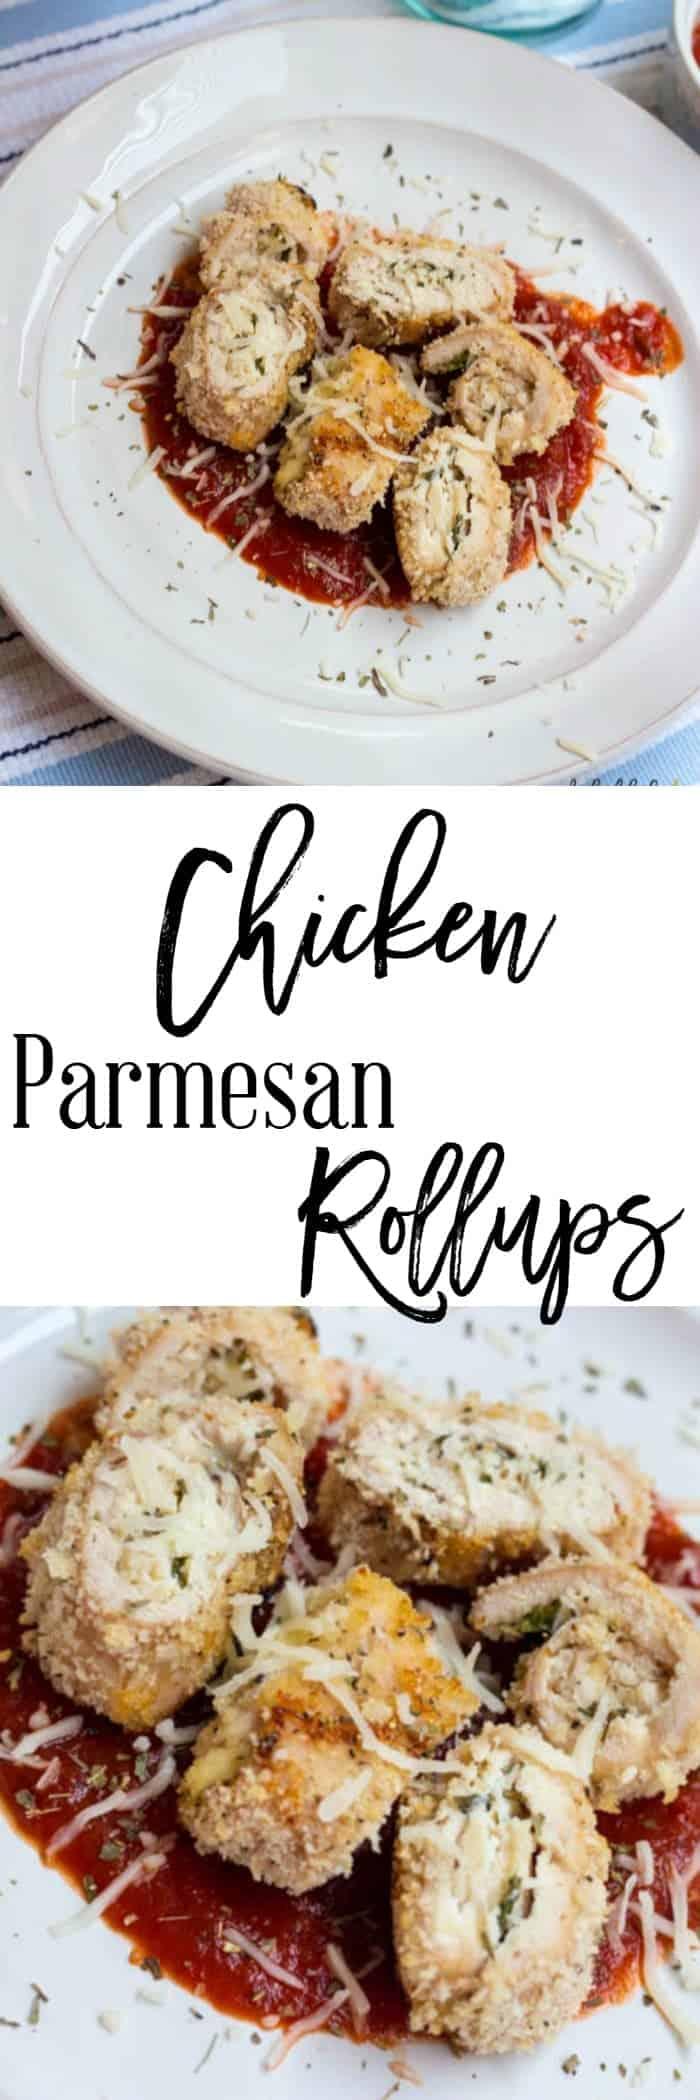 Chicken Parmesan Rollups